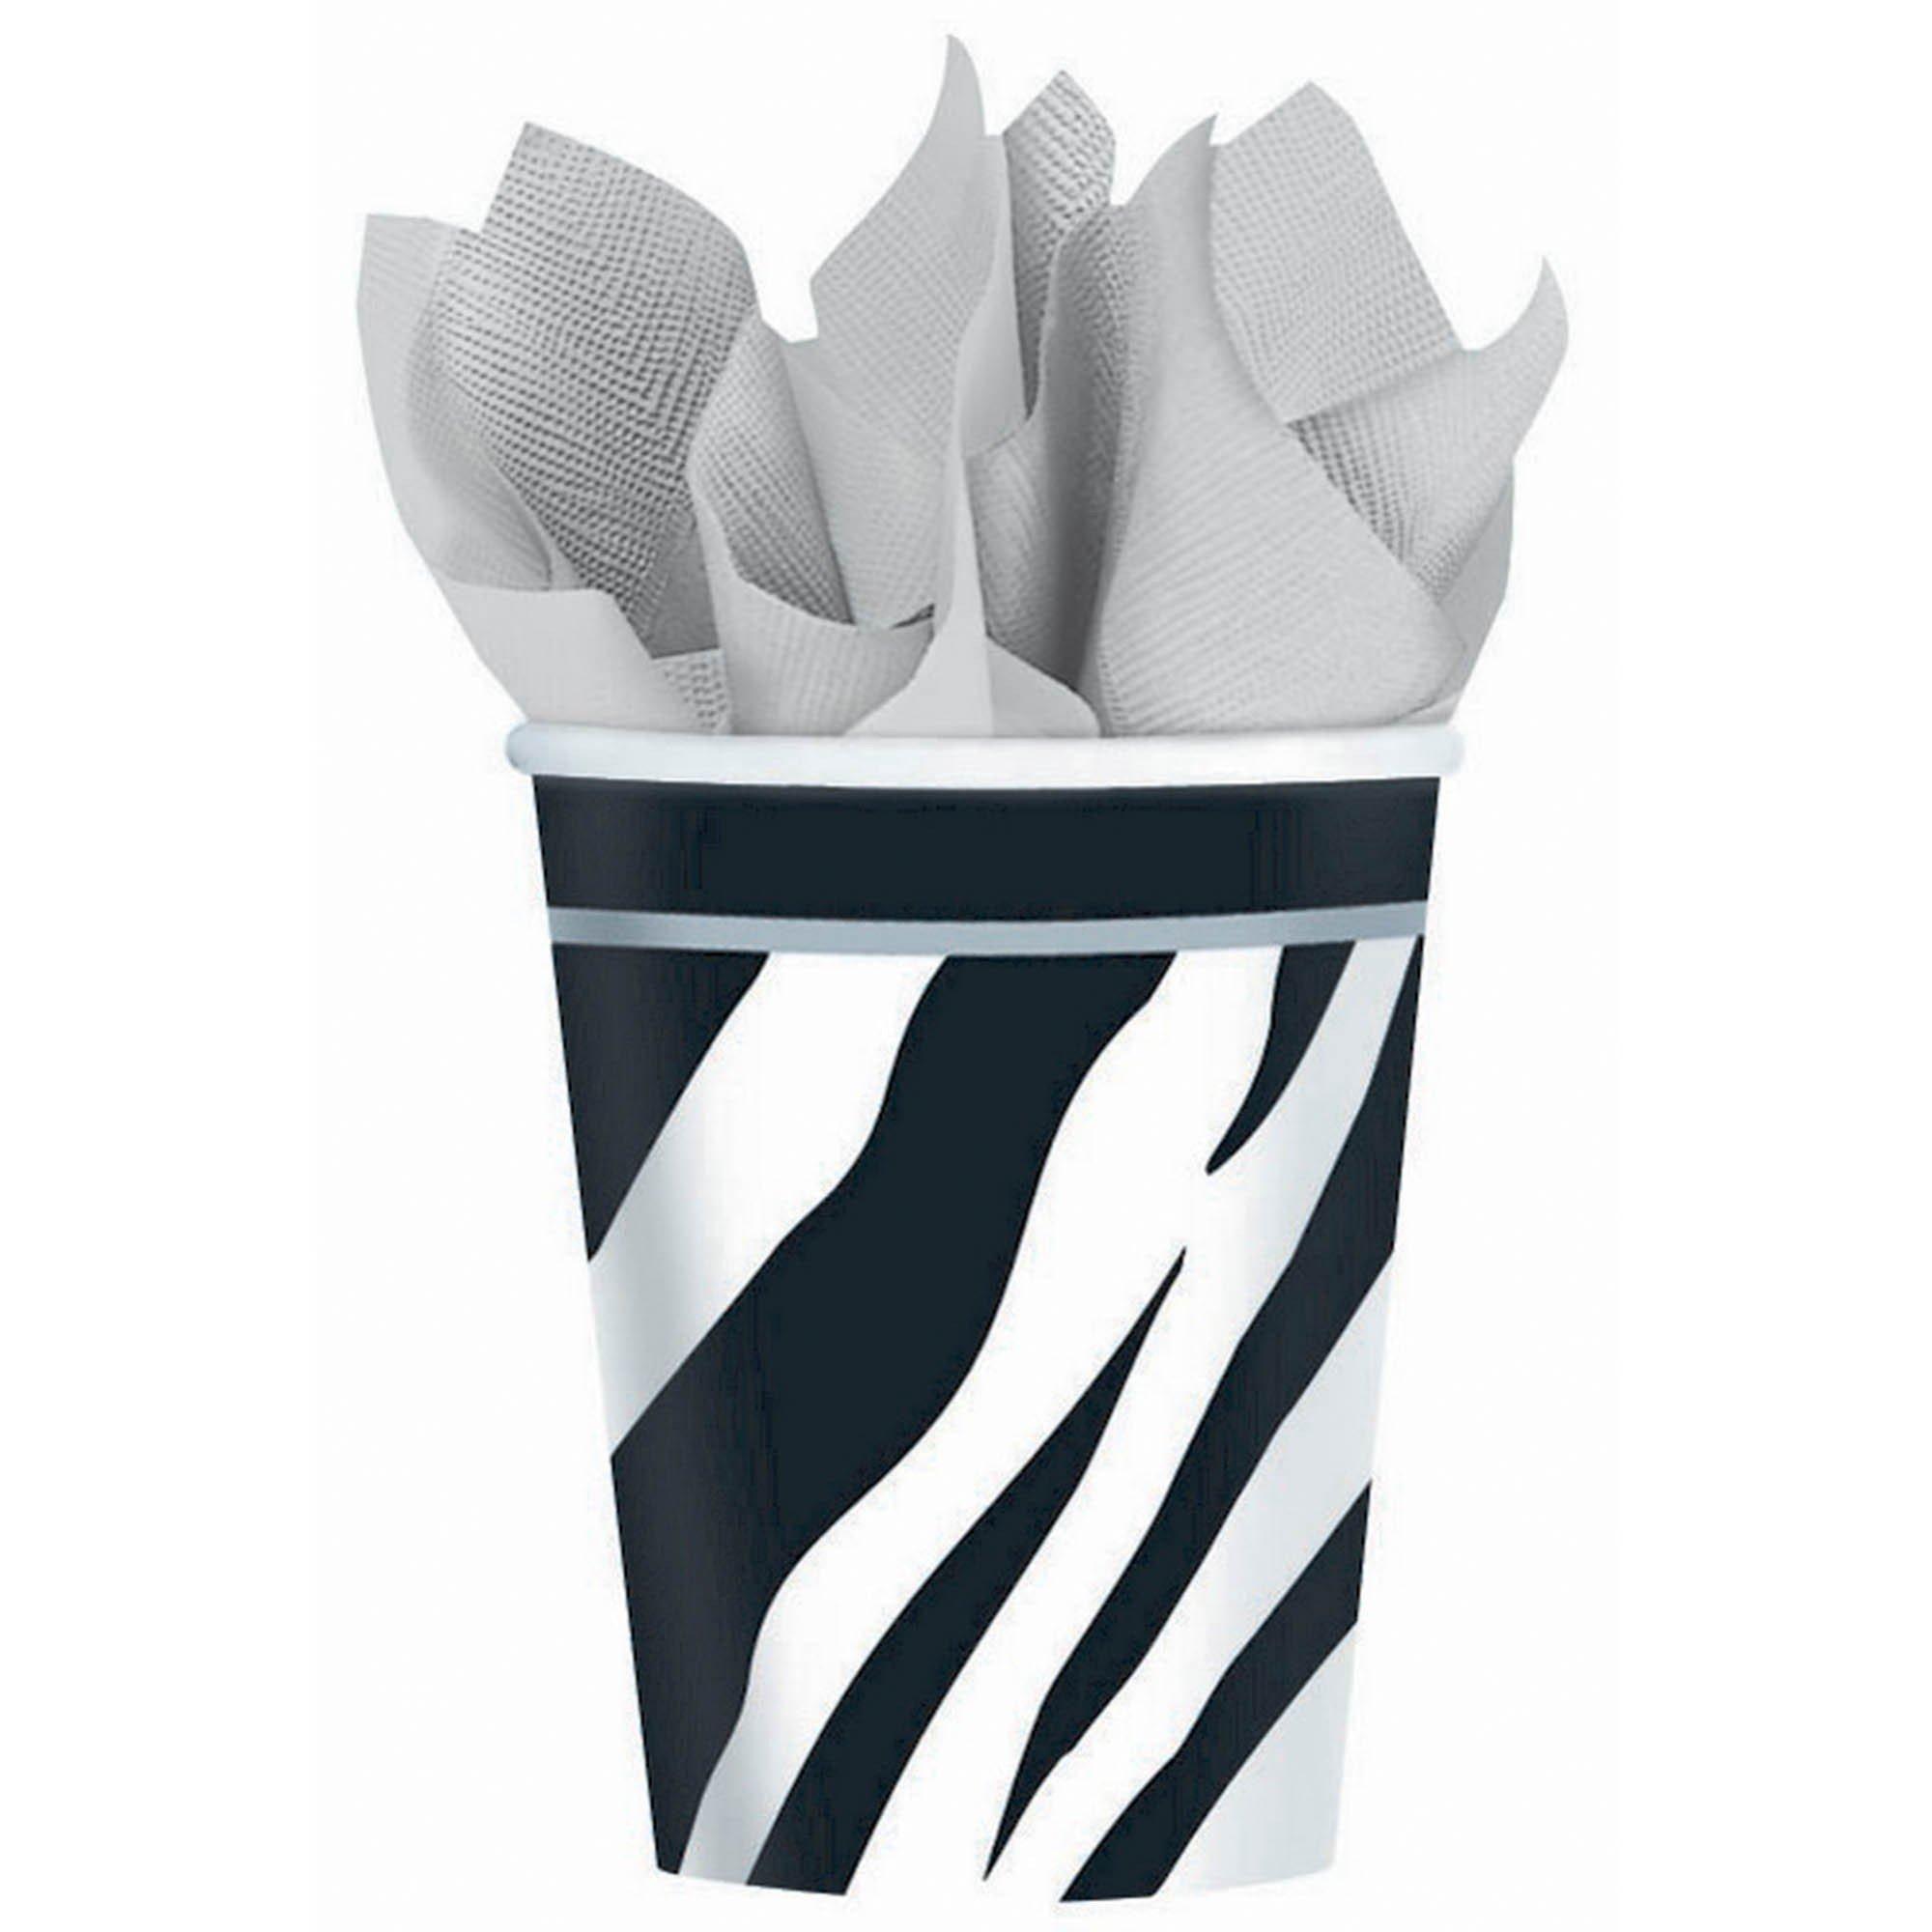 Zebra MID CT 9oz/266ml Cups